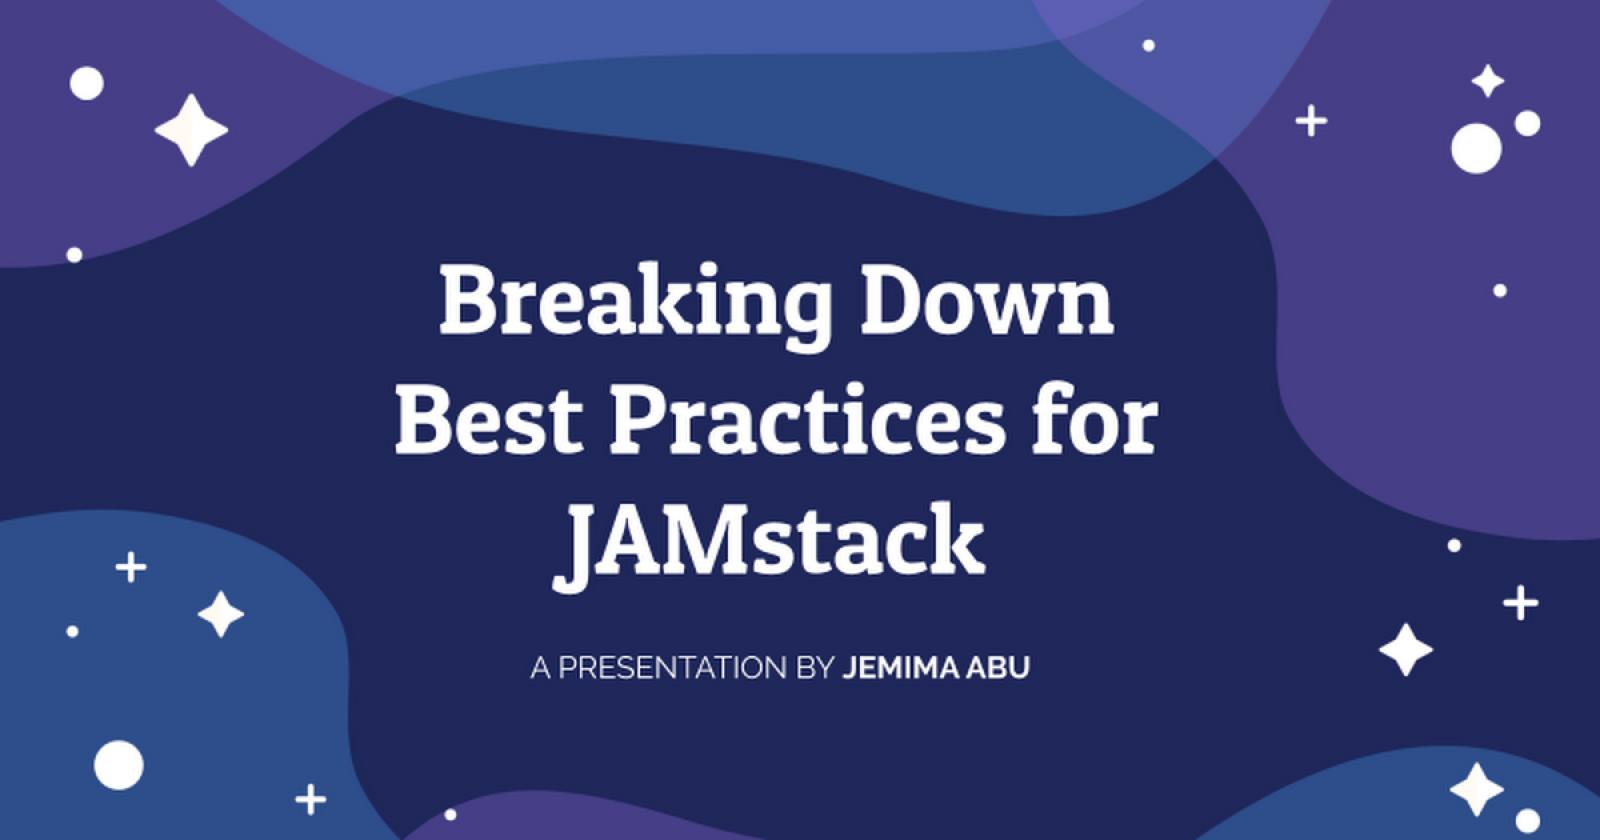 Breaking Down Best Practices for JAMstack